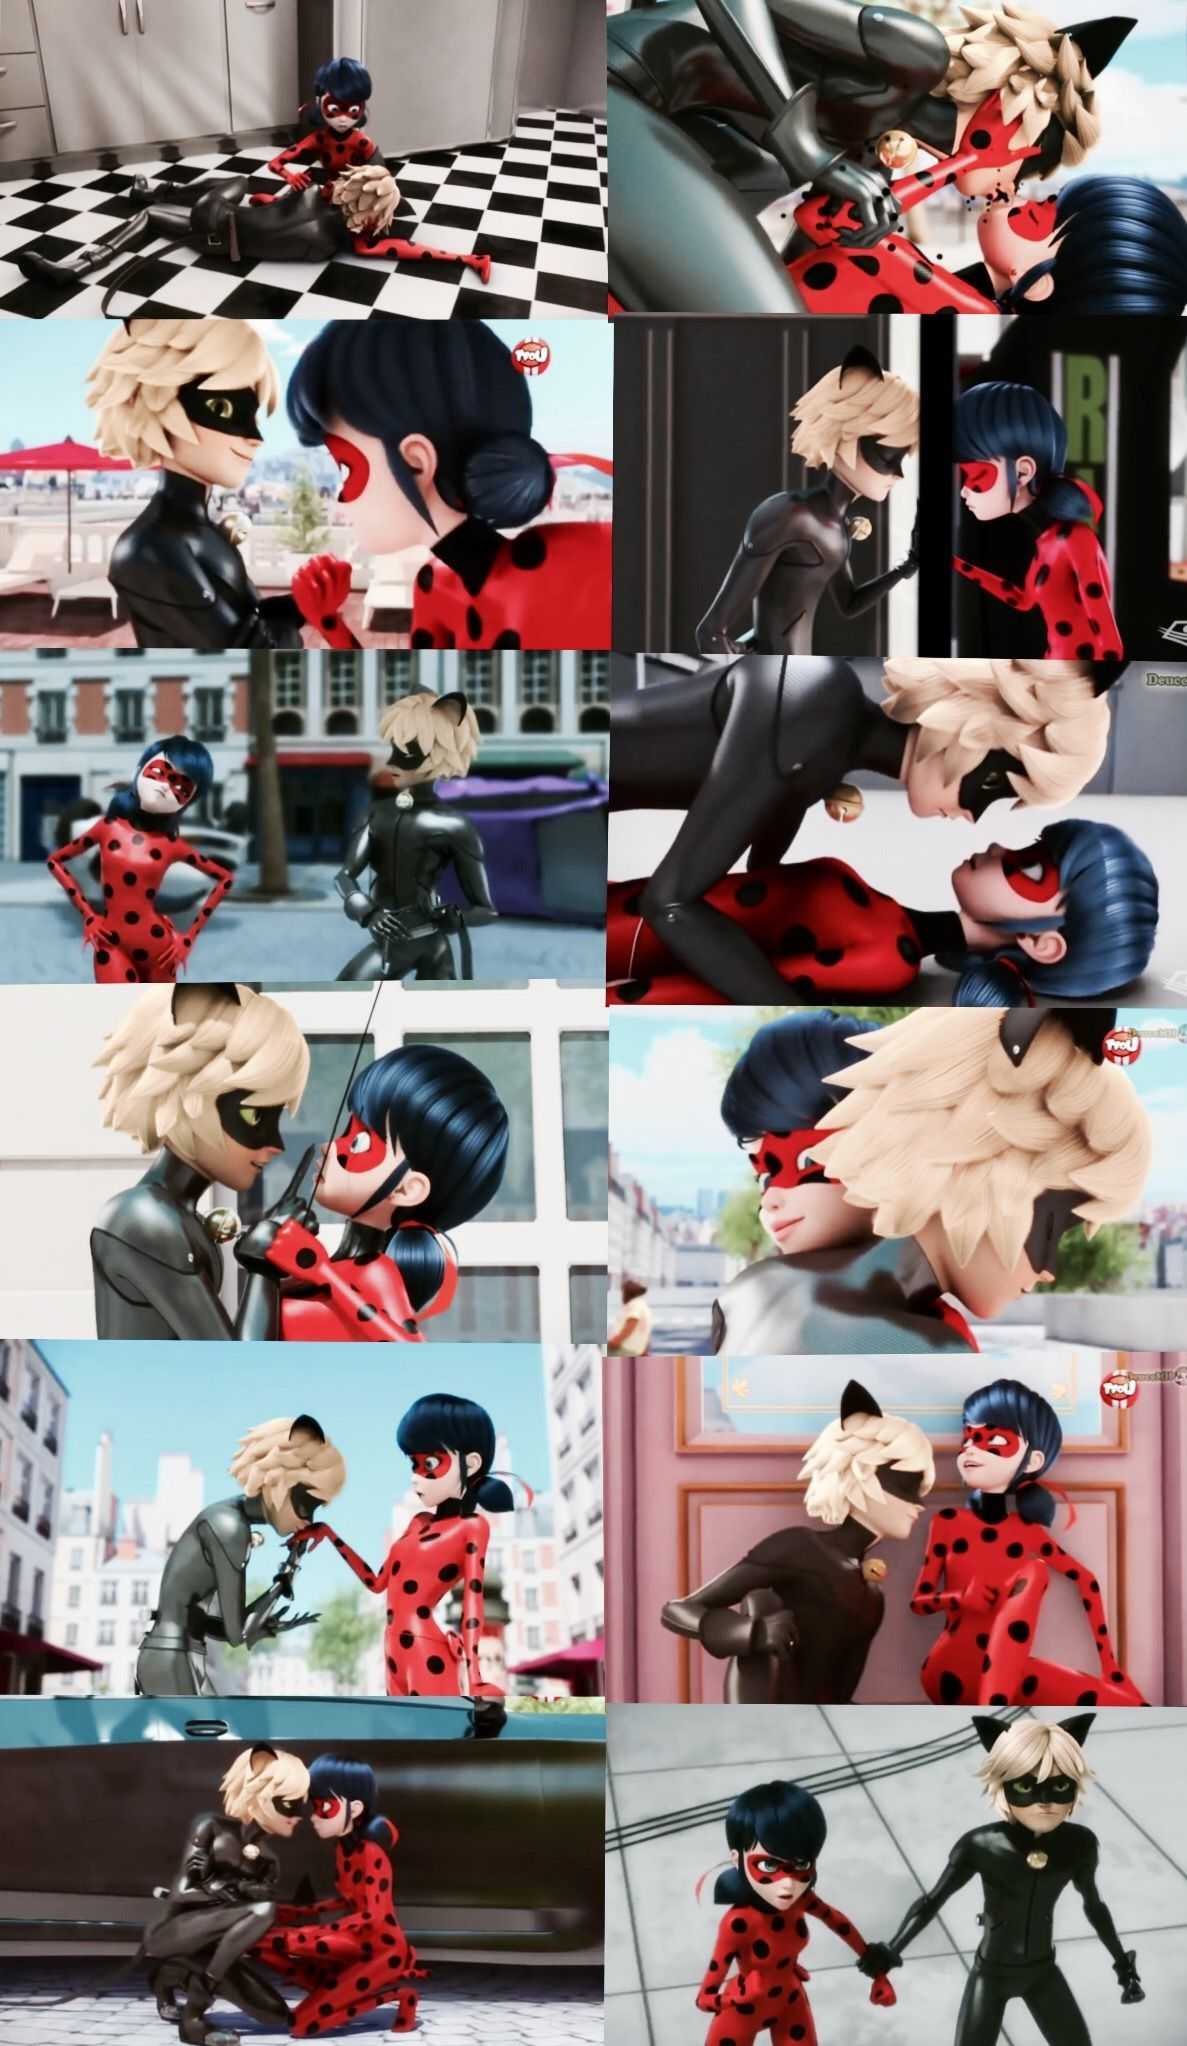 Ladybug And Cat Noir Cute Moments : ladybug, moments, Ladybug, Romantic, Moments, Momentos, Romanticos, #catre…, Miraculous, Movie,, Anime,, Comic